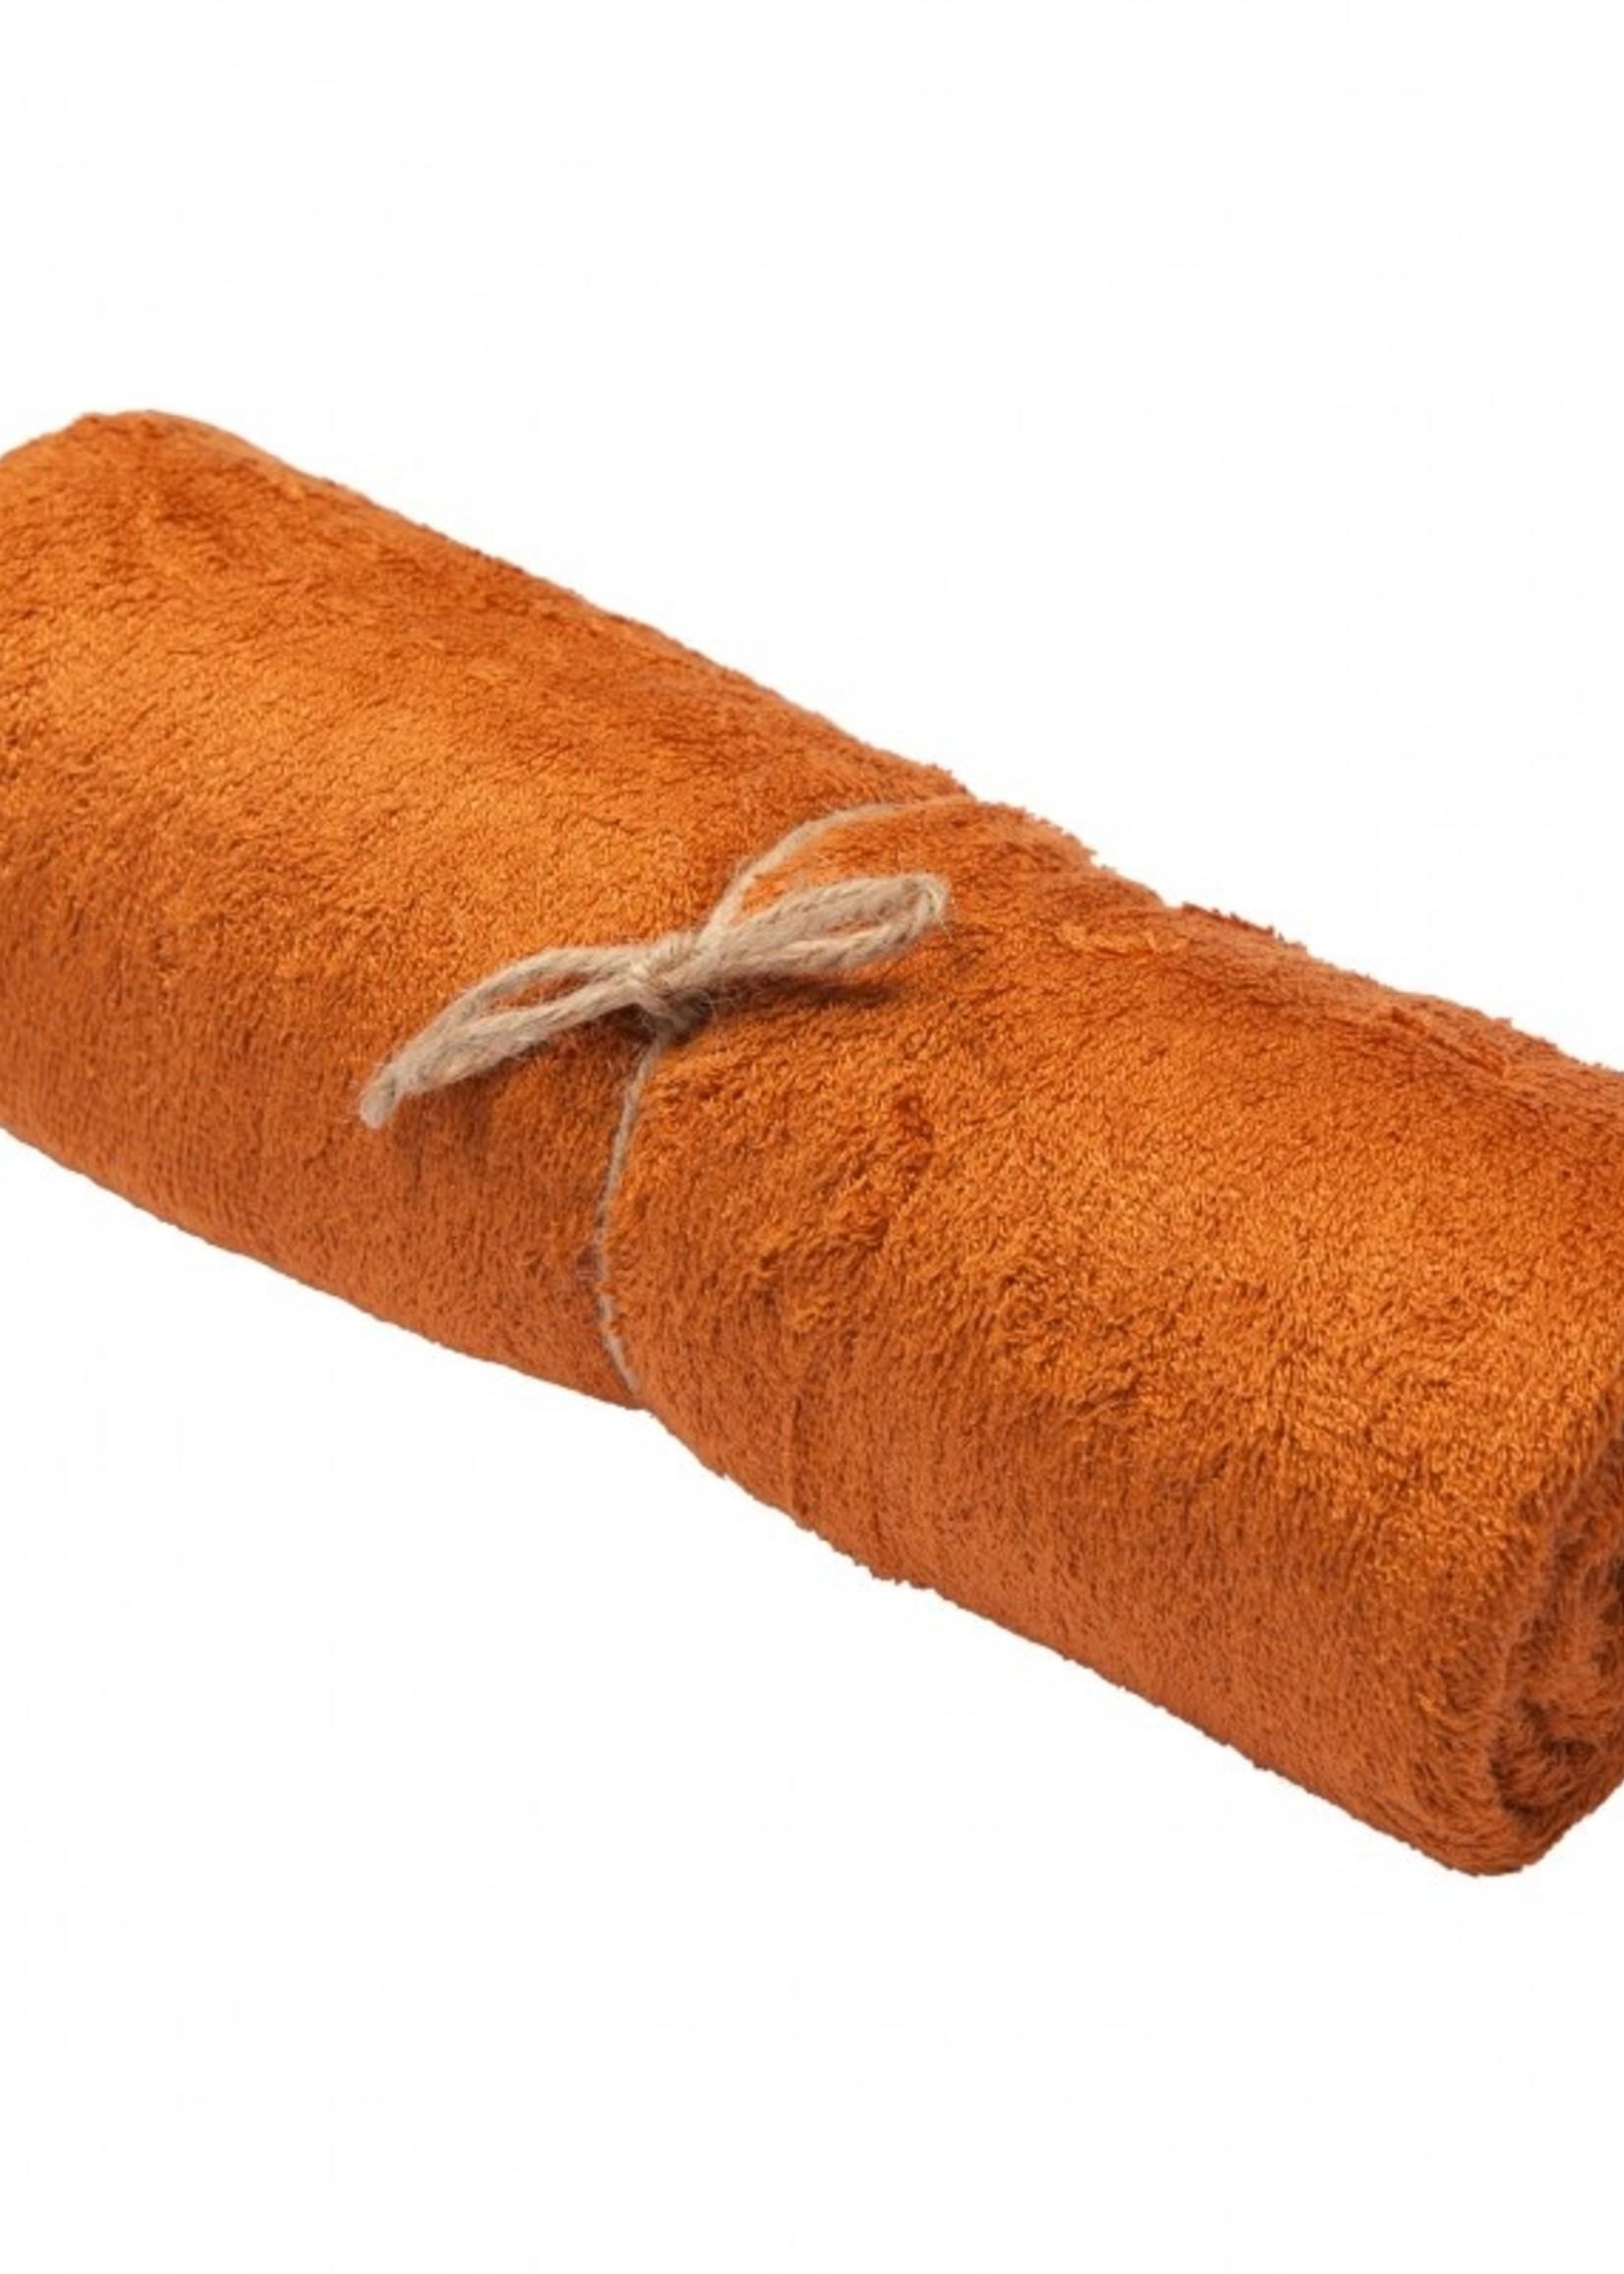 Timboo Towel 74x110 cm Inca Rust